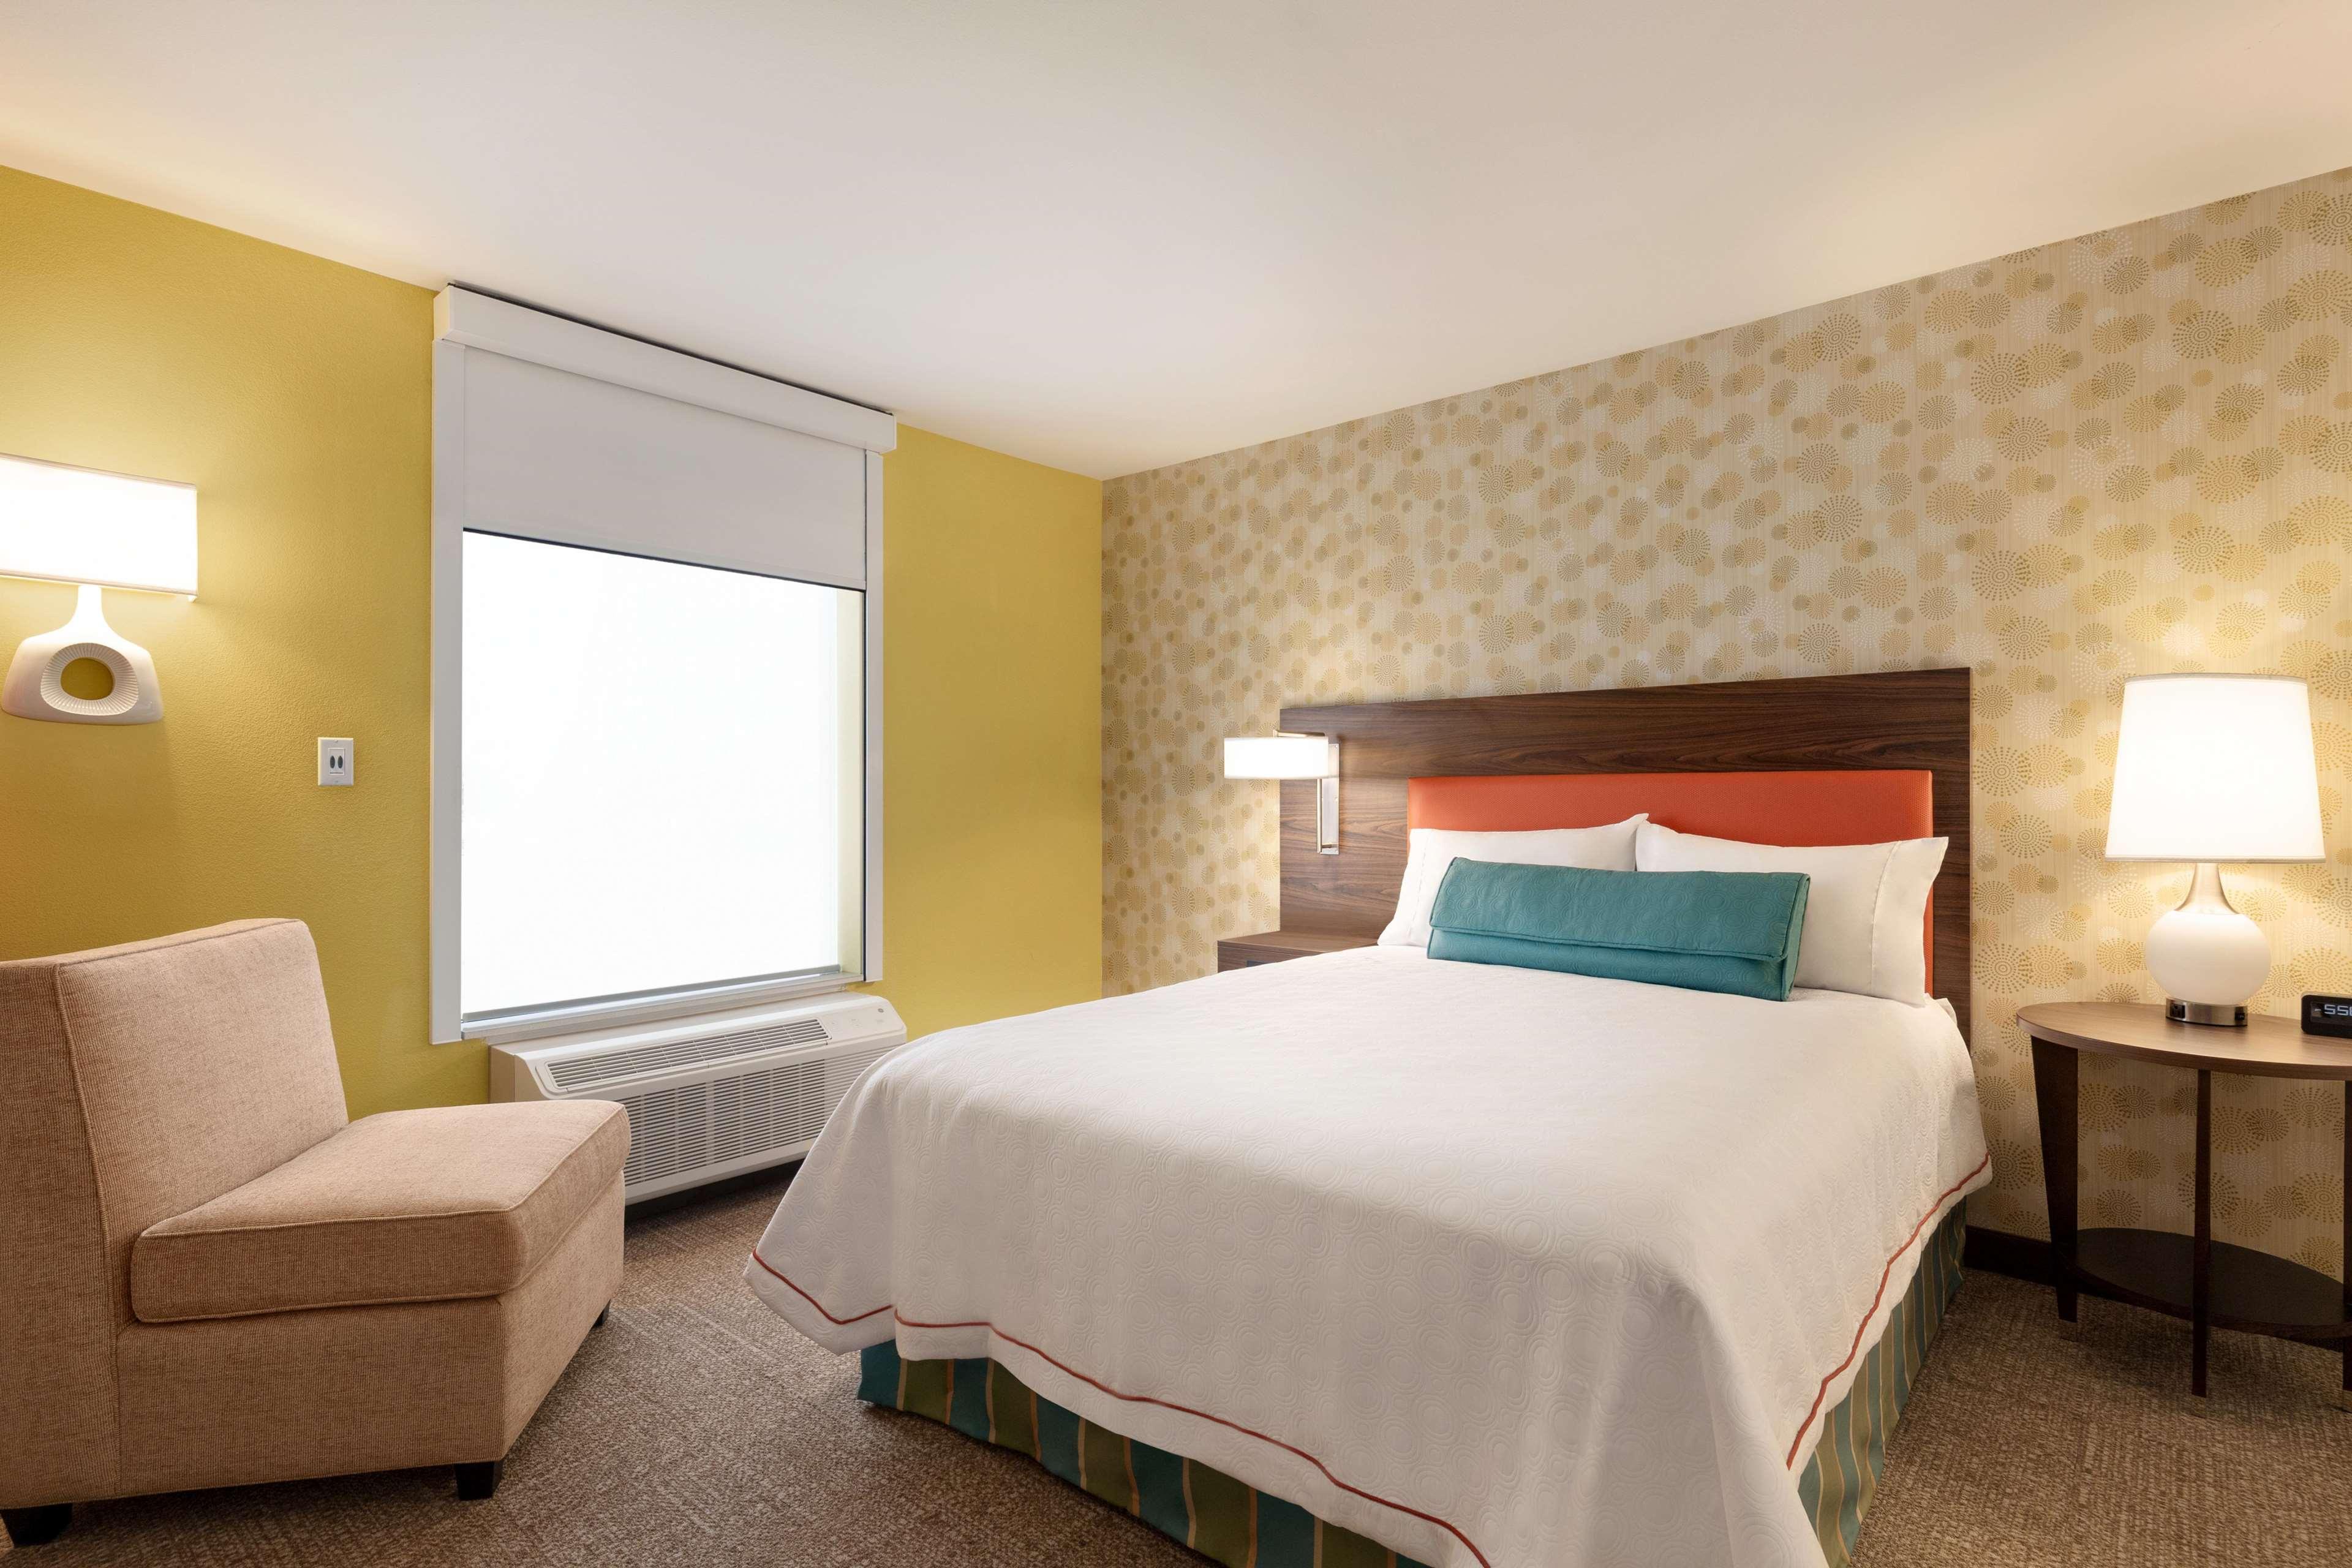 Home2 Suites by Hilton Waco image 5